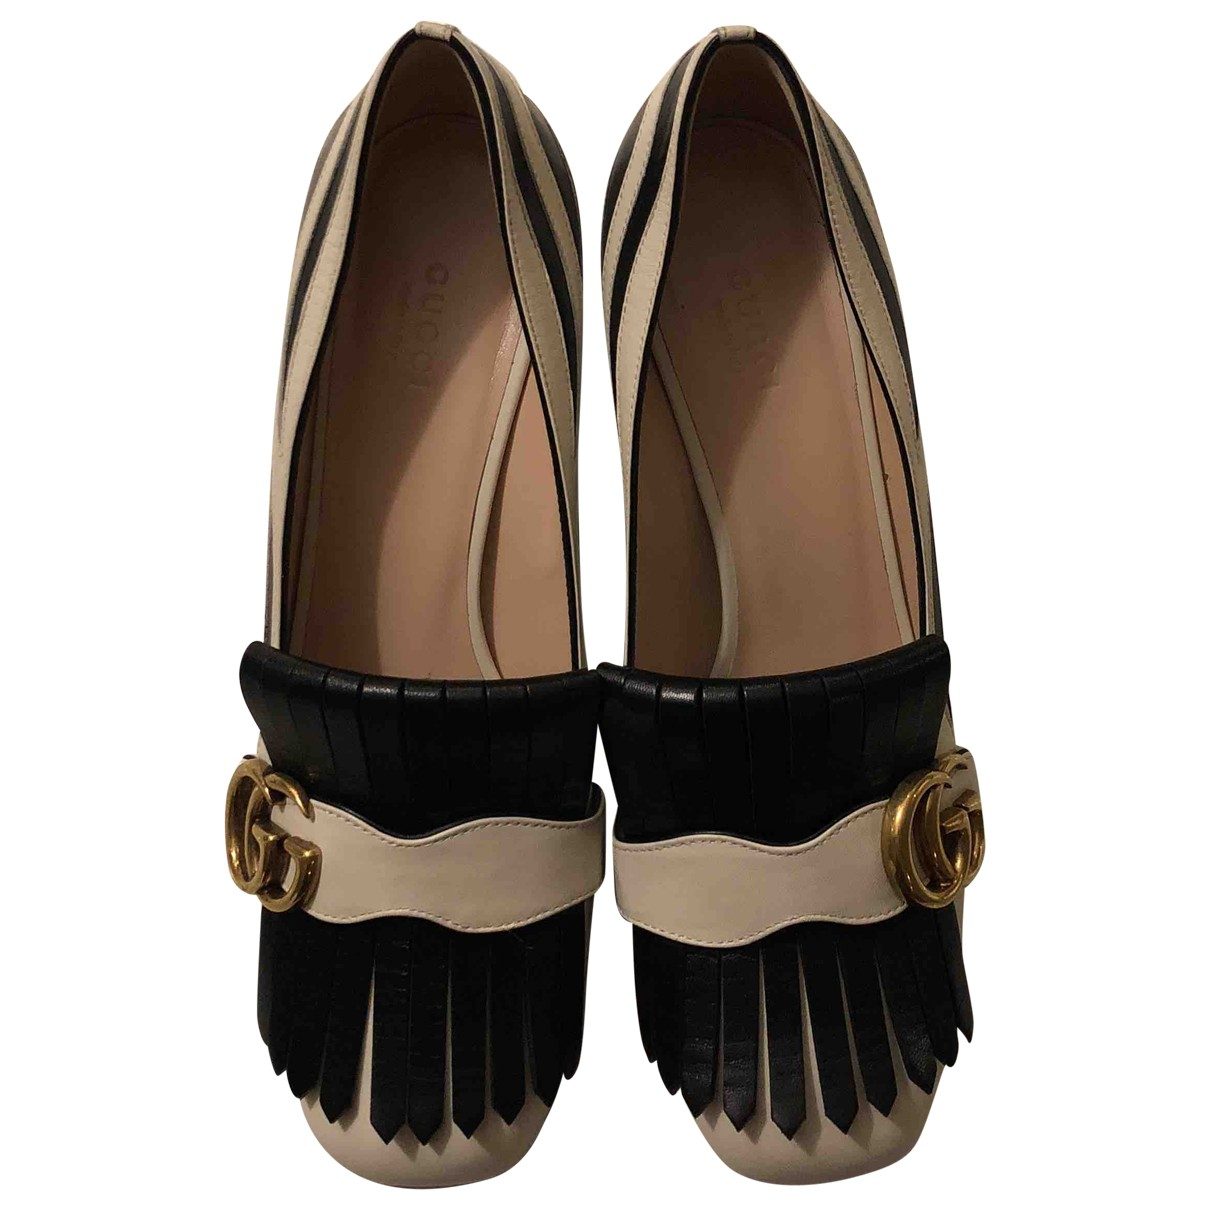 Gucci Marmont Ecru / Black Leather Flats for Women 38.5 IT